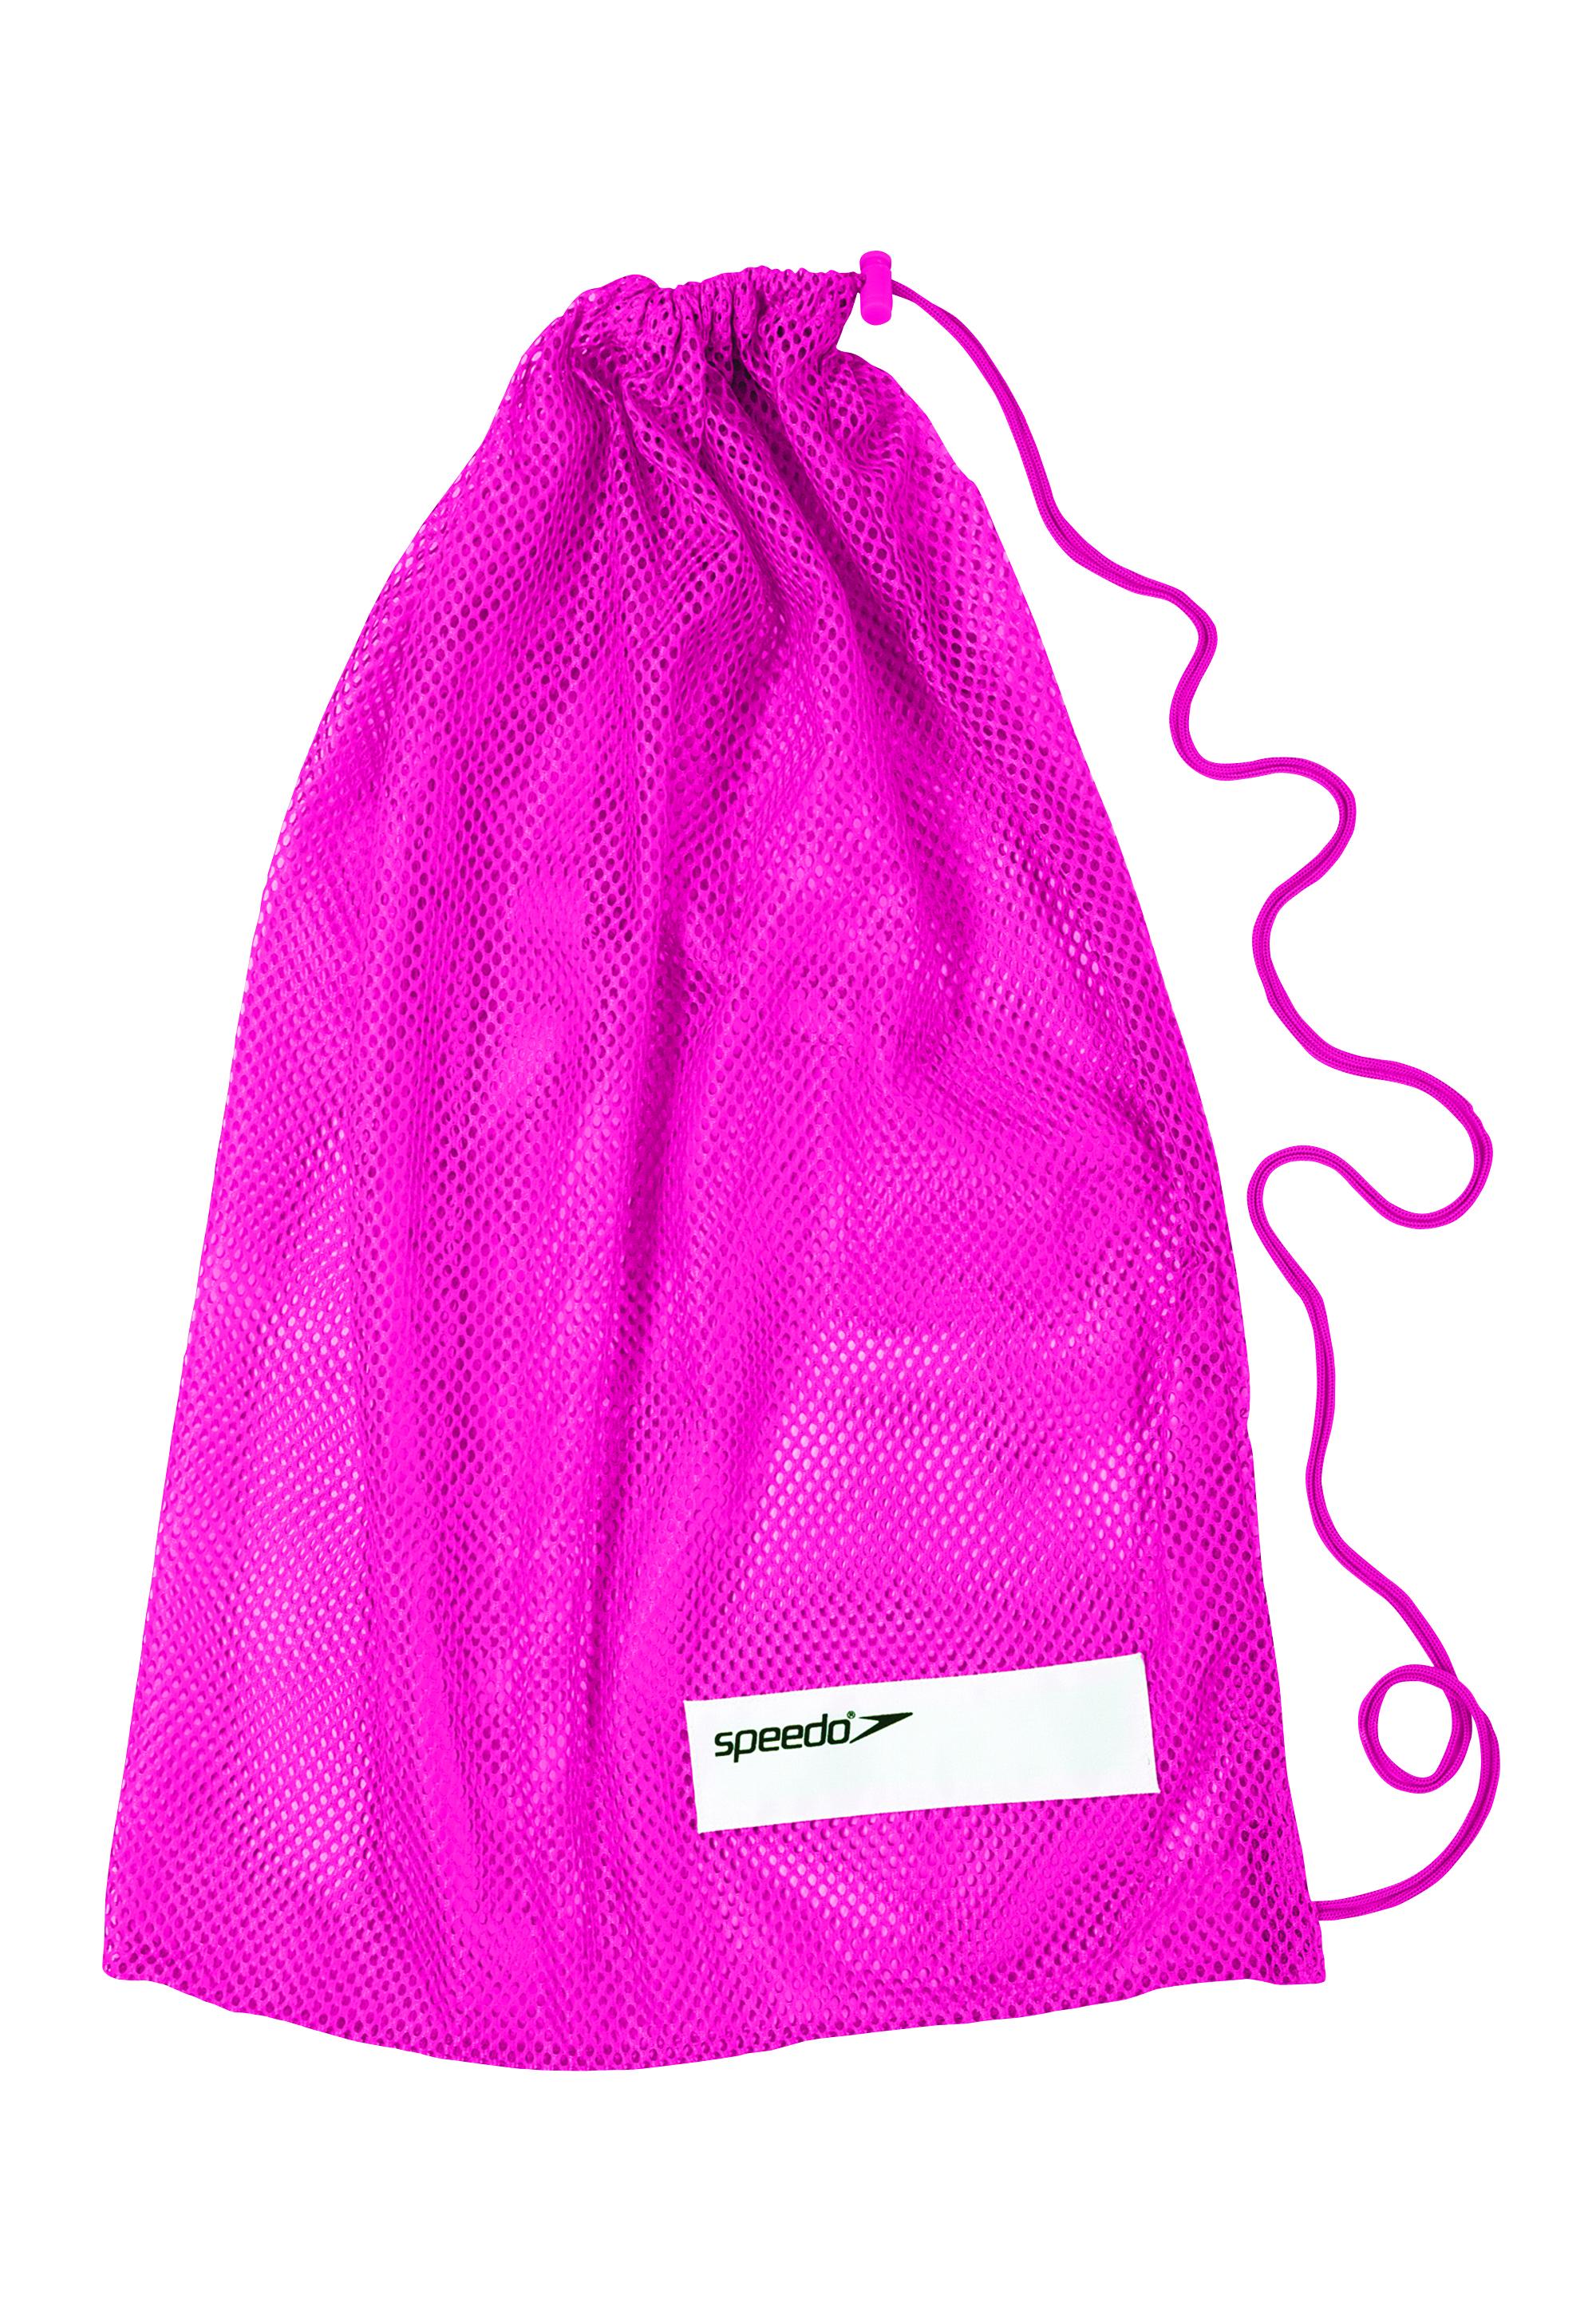 Speedo Mesh Equipment Pool Gear Swimming Bag Pink Ebay